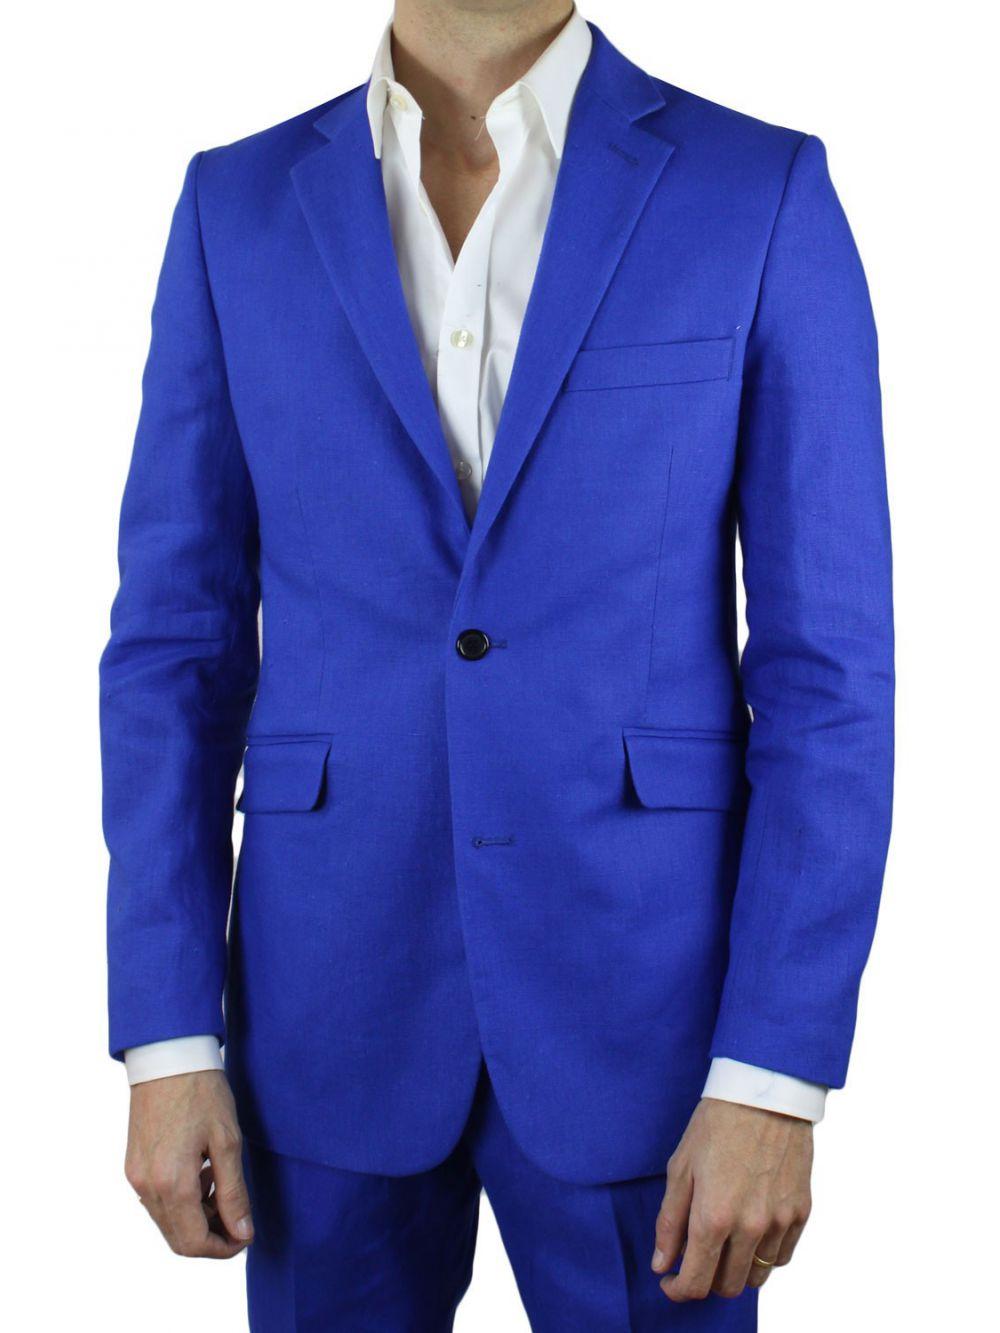 costume lin bleu pas cher costume homme kebello. Black Bedroom Furniture Sets. Home Design Ideas